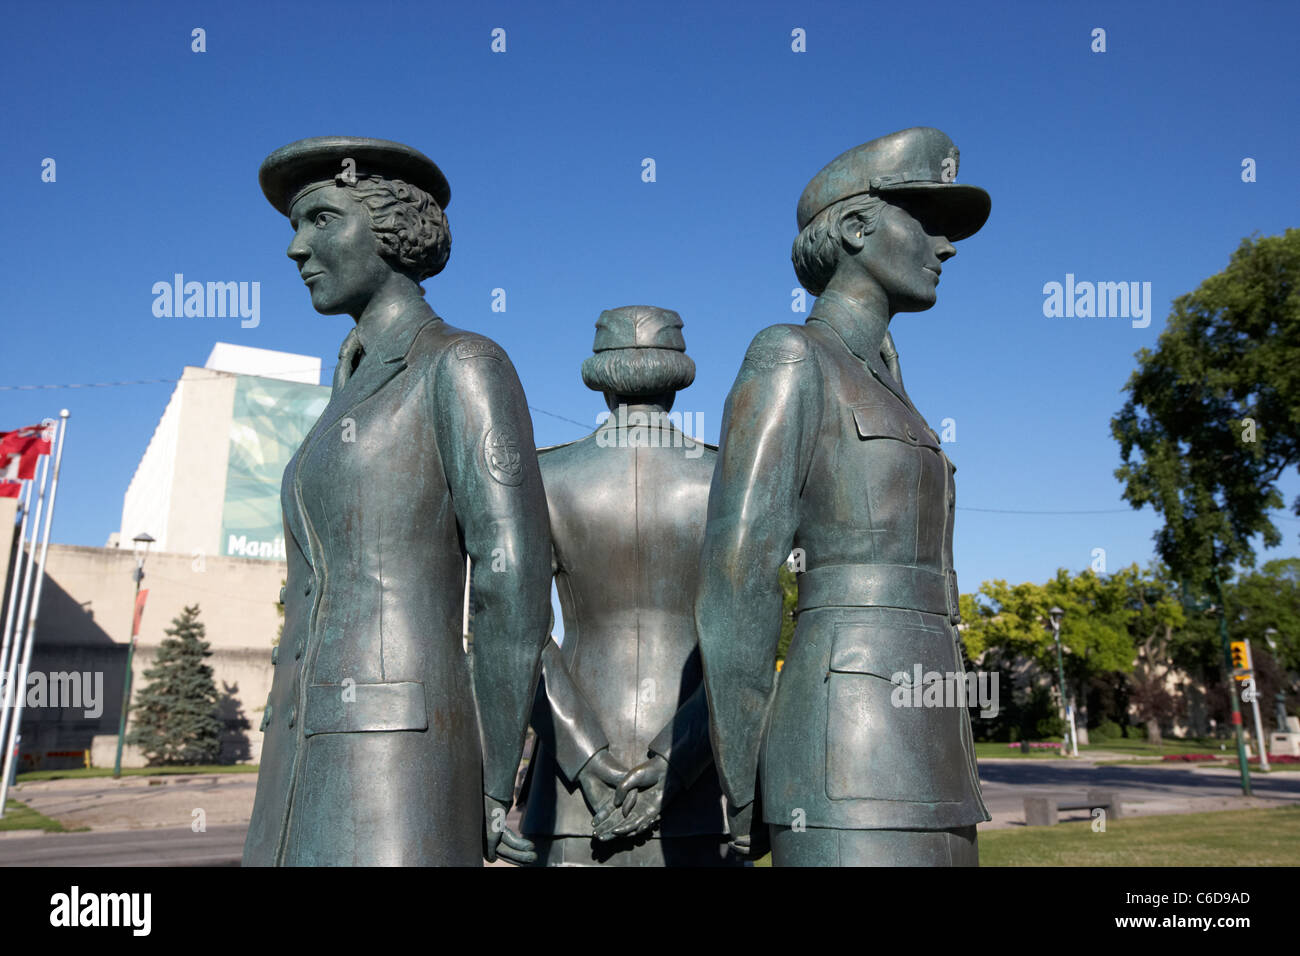 womens tri service war memorial for canadian ww2 servicewomen memorial boulevard winnipeg manitoba canada - Stock Image